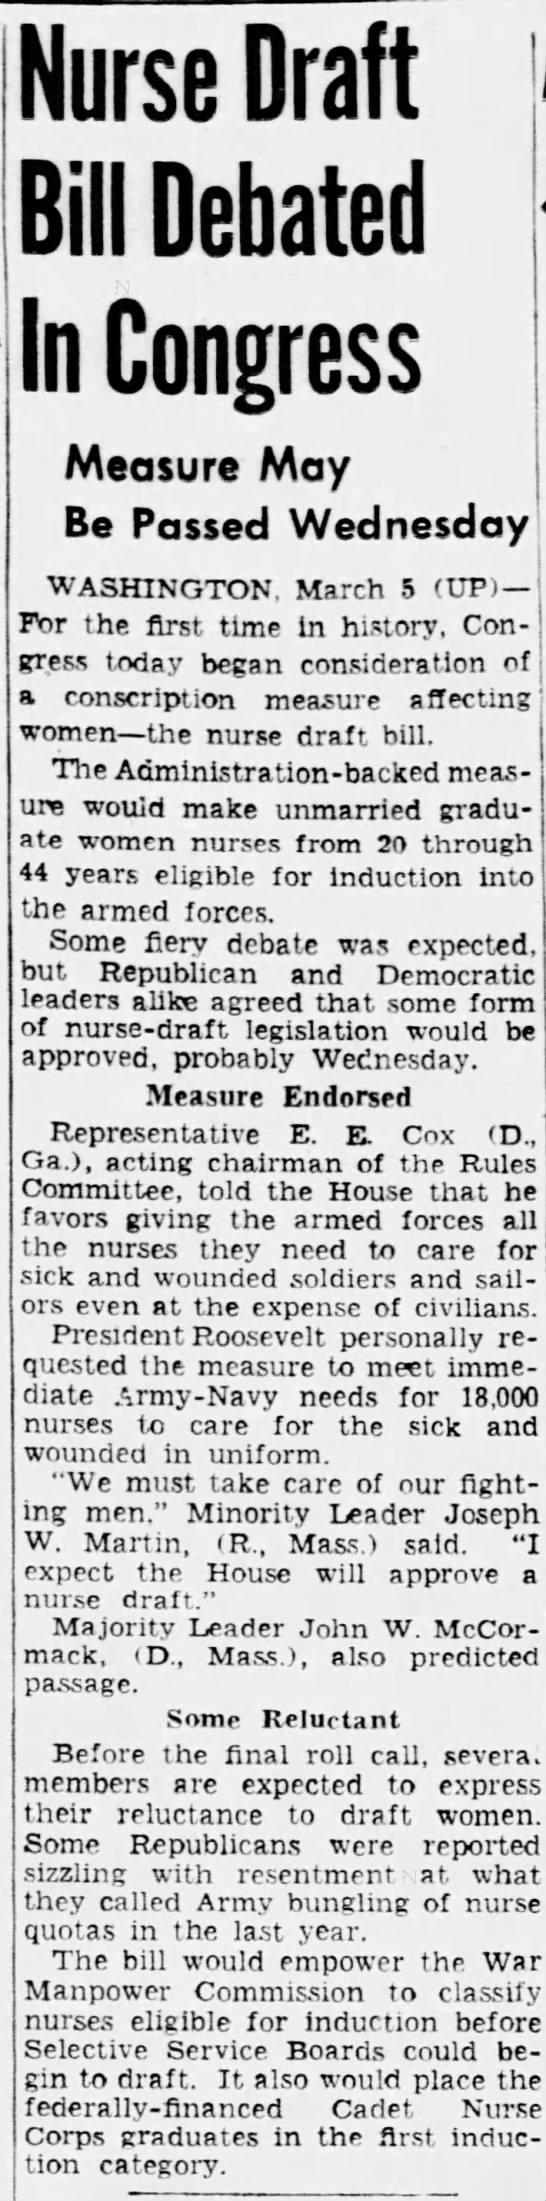 The Pittsburgh Press 3/5/45 - Nurse Draft Bill Debated In Congress Measure...